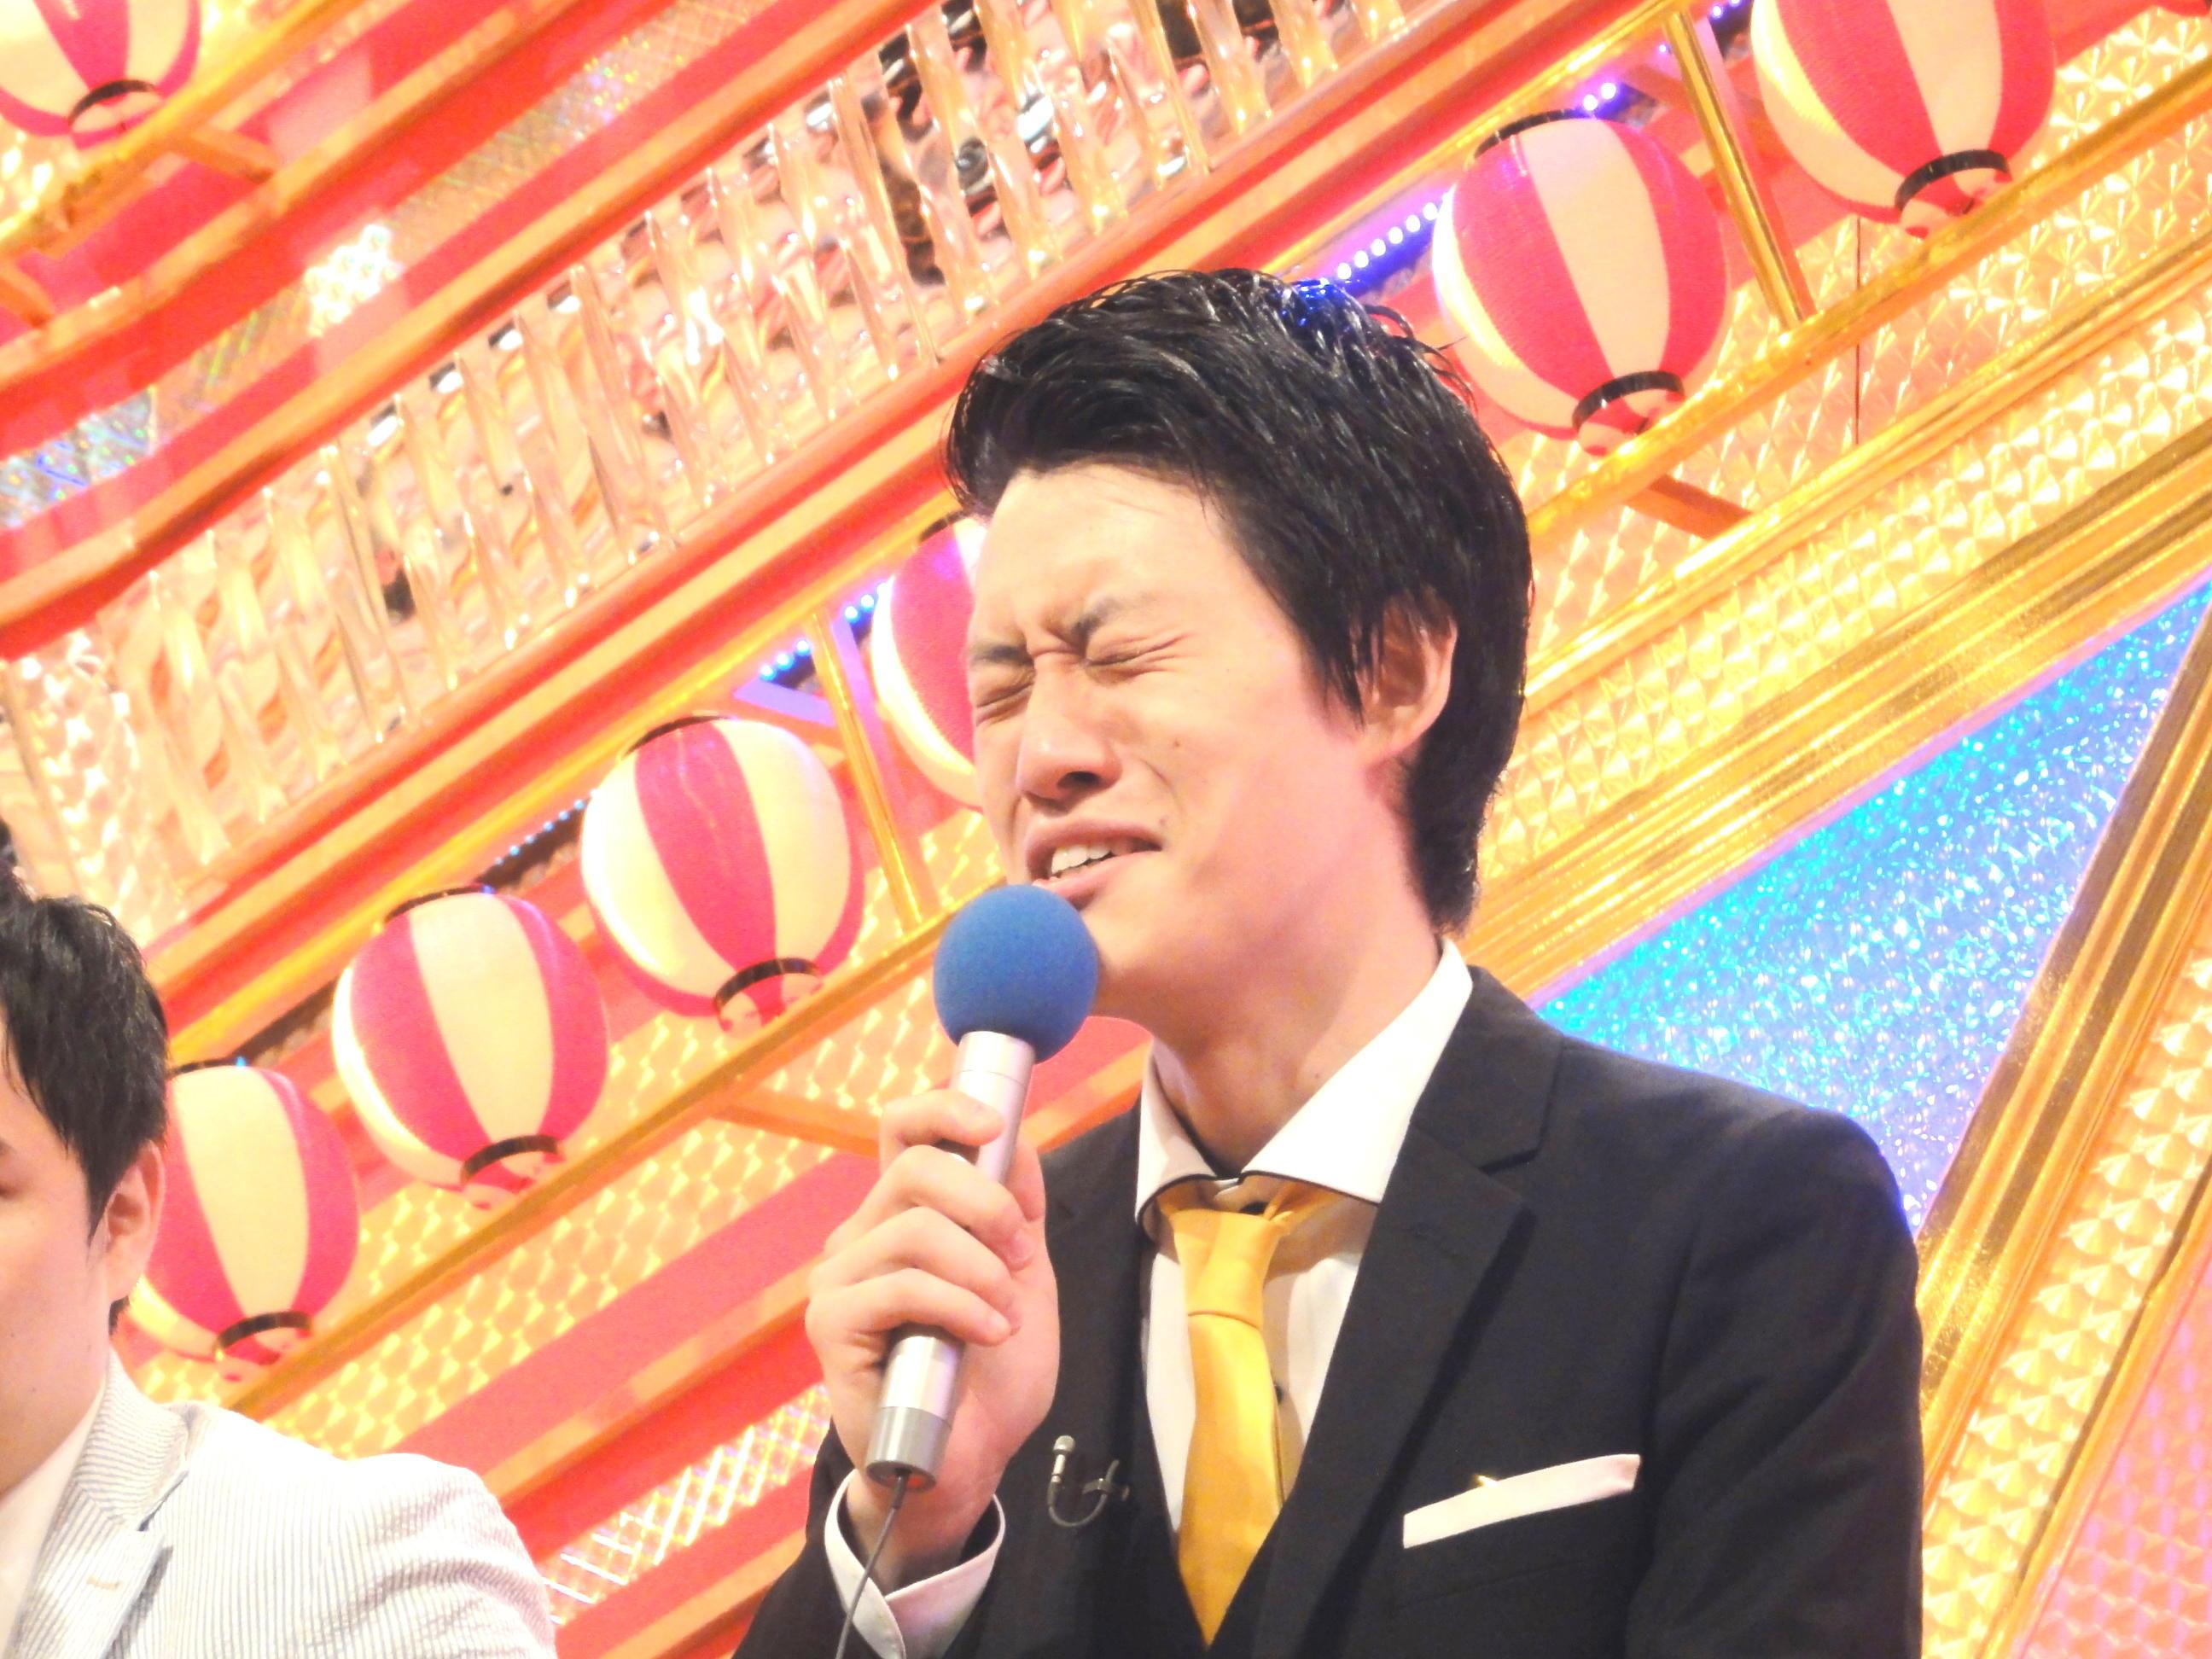 http://news.yoshimoto.co.jp/20170712105321-843ce47f3e989bc34f3ccedc84b79e43e055e7d1.jpg